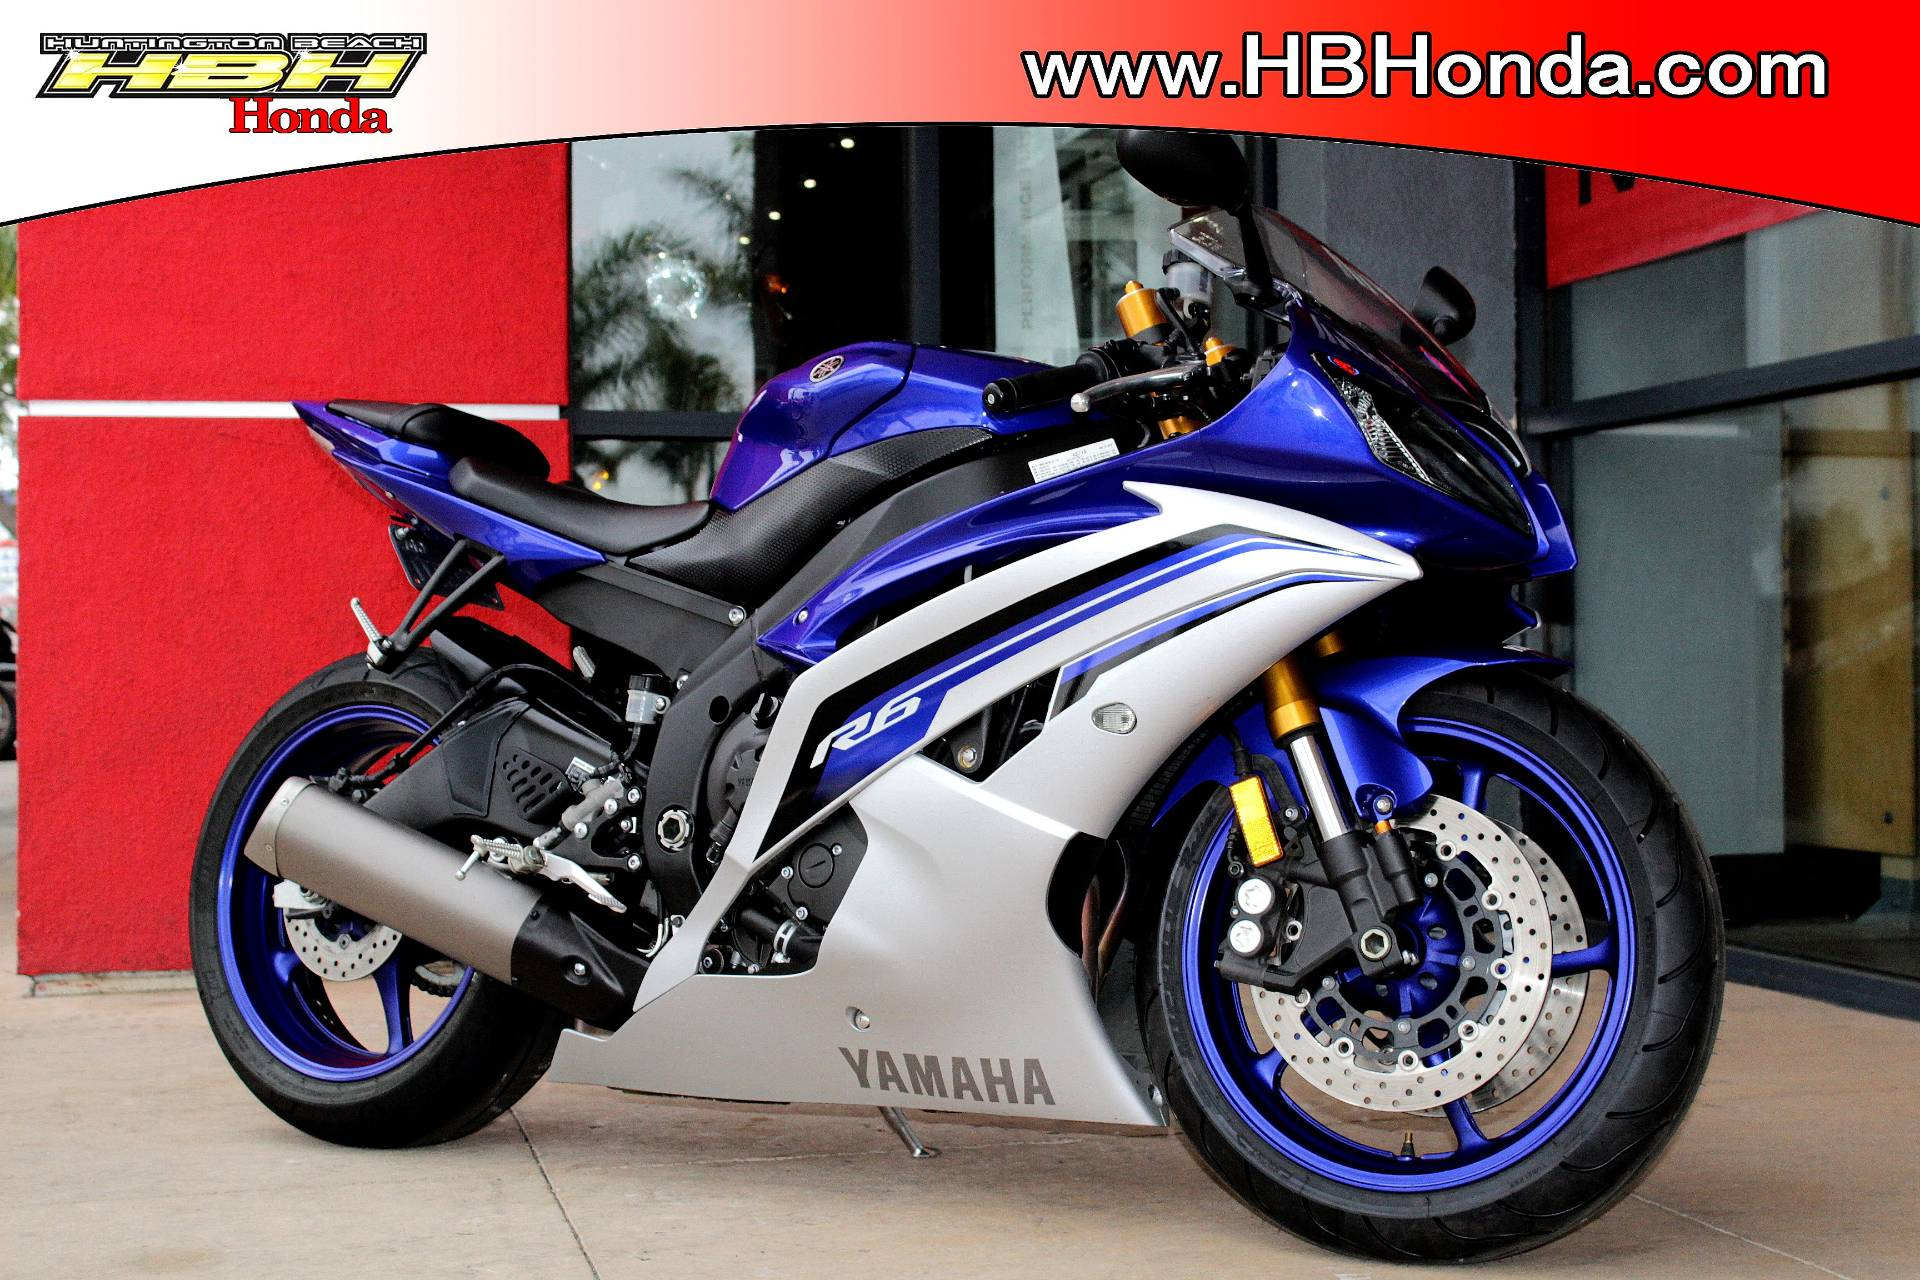 2016 Yamaha Yzf R6 In Huntington Beach California